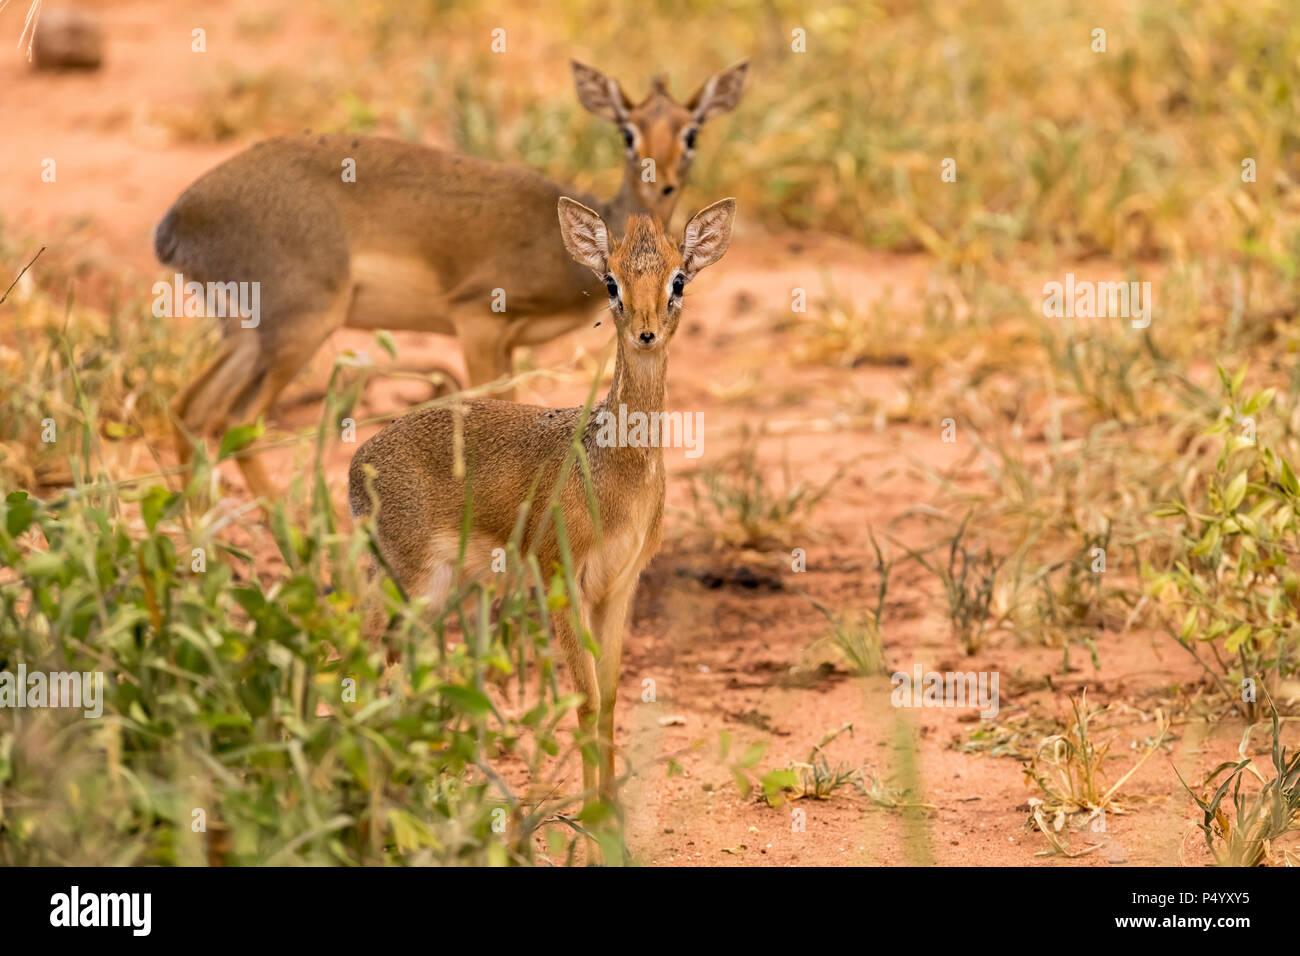 Kirk's Dik-Dik (Madoqua kirkii) on the savannah in Tarangire National Park, Tanzania - Stock Image